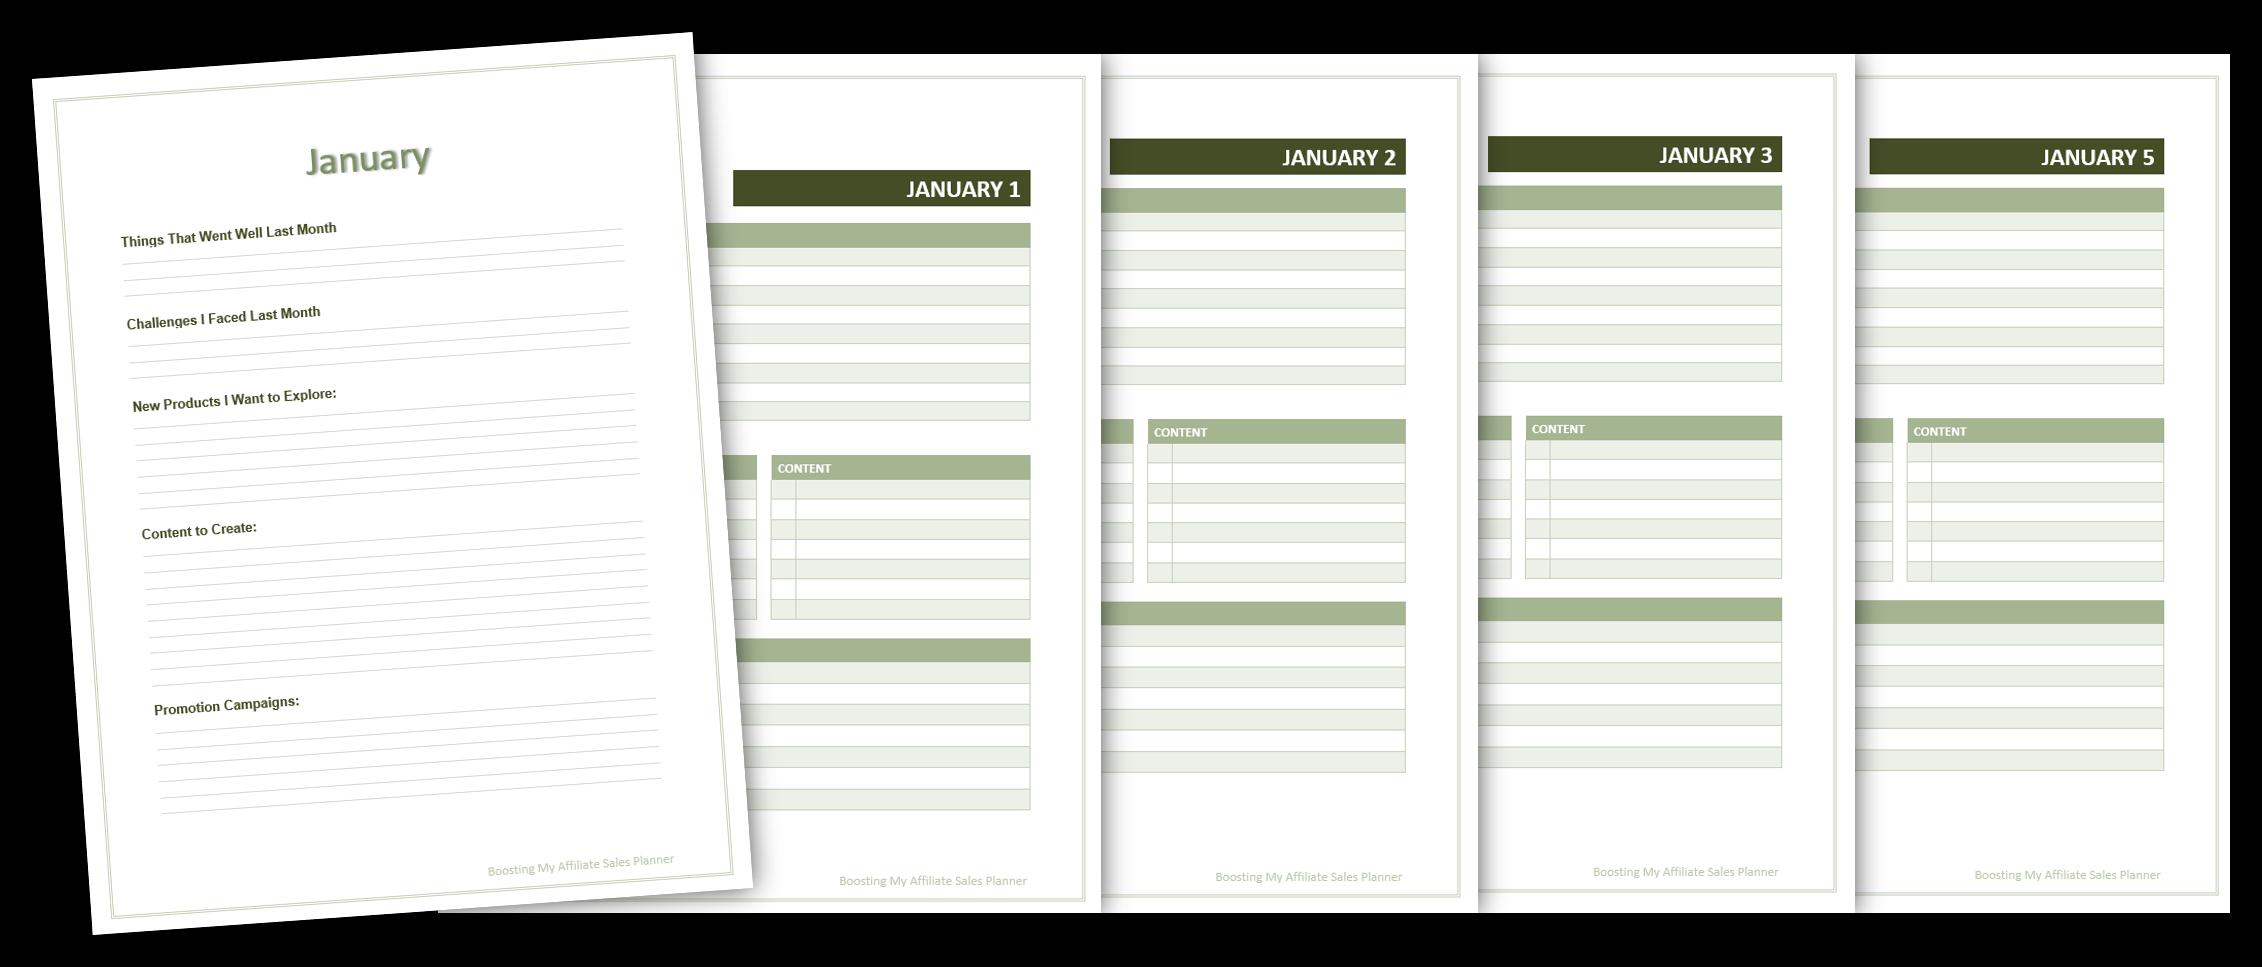 boosting my affiliate sales planner image 1